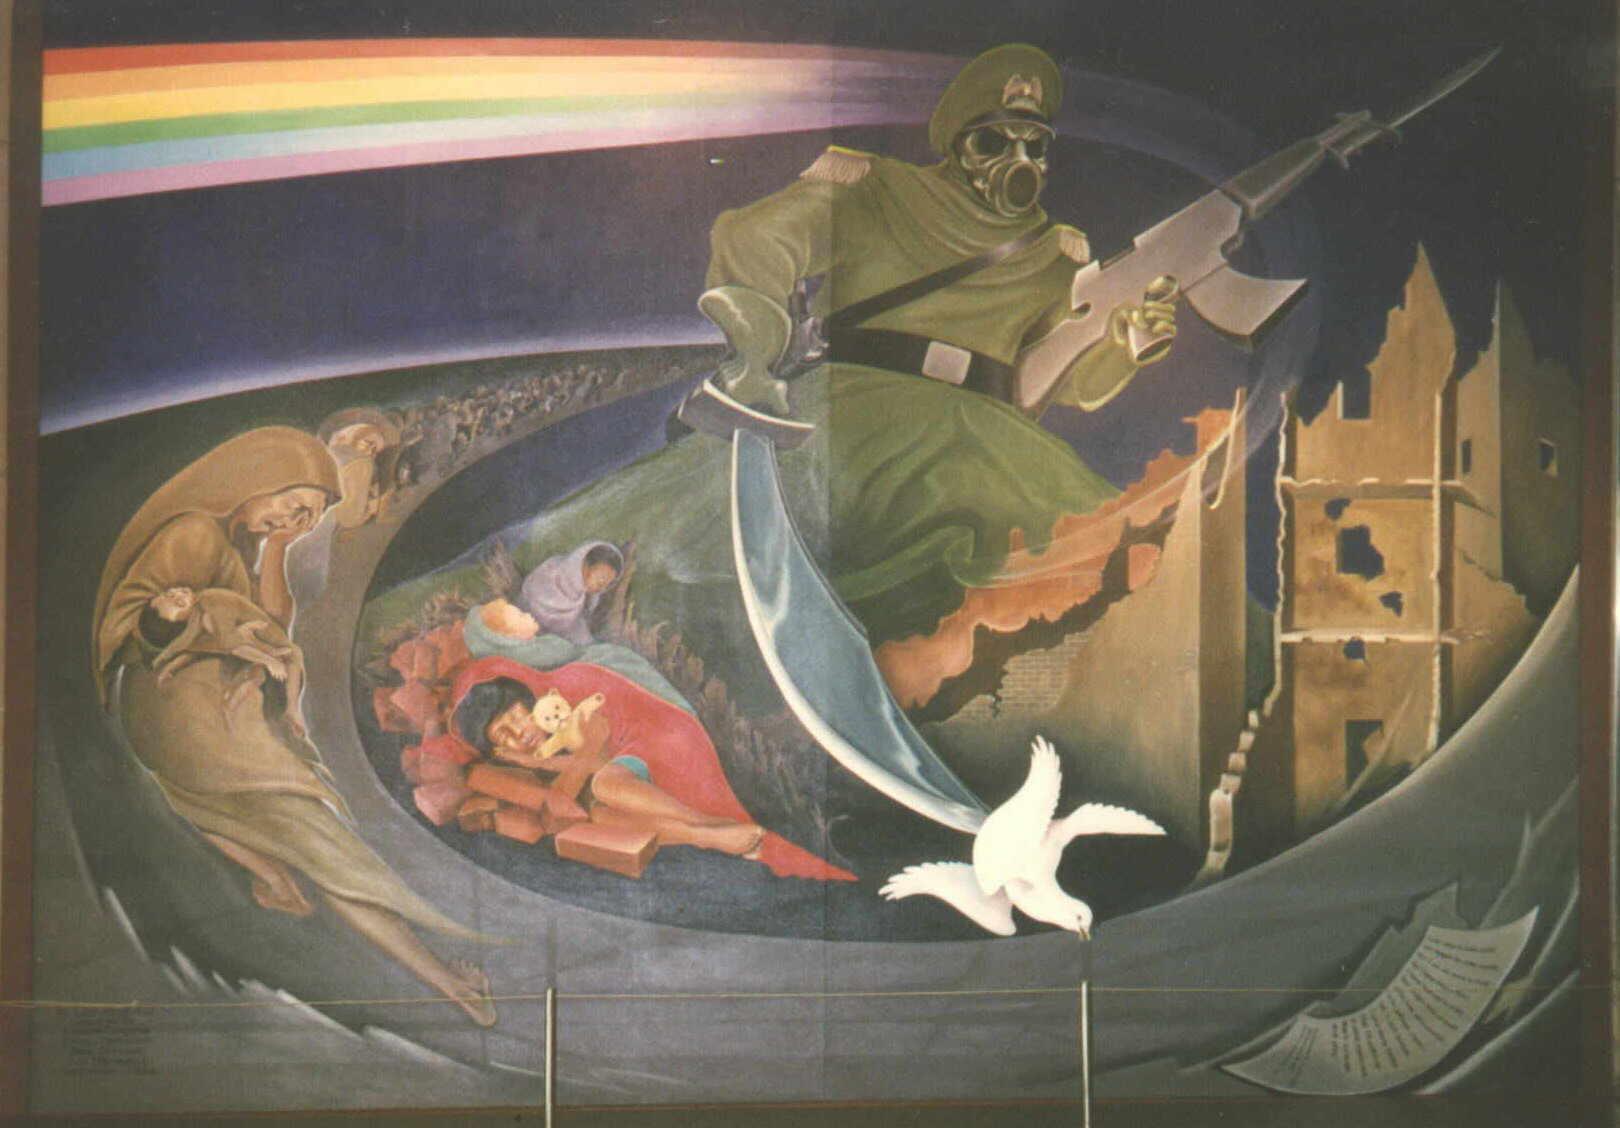 Denver Airport Wall Murals Denver International Airport Freimaurer Symbolik Seite